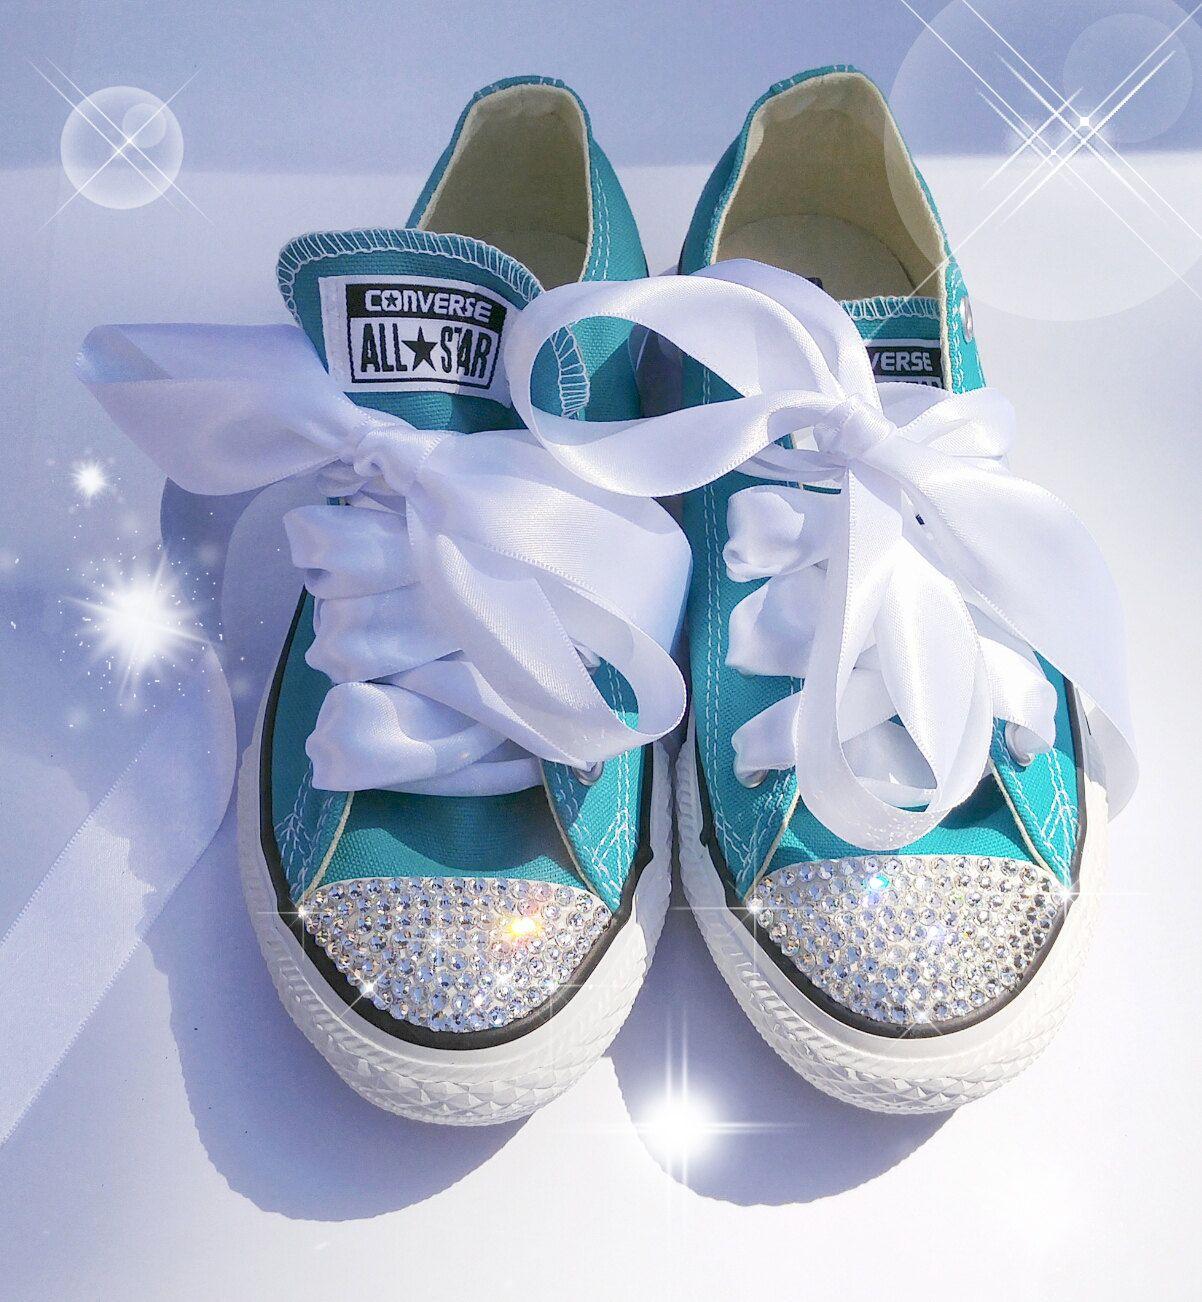 cb68fc4f9 Custom Toddler Converse, Swarovski Converse, Bling Converse, Blinged out  Converse, Custom Converse, Converse Bling shoes, Crystal Converse by  AllureDesignz ...